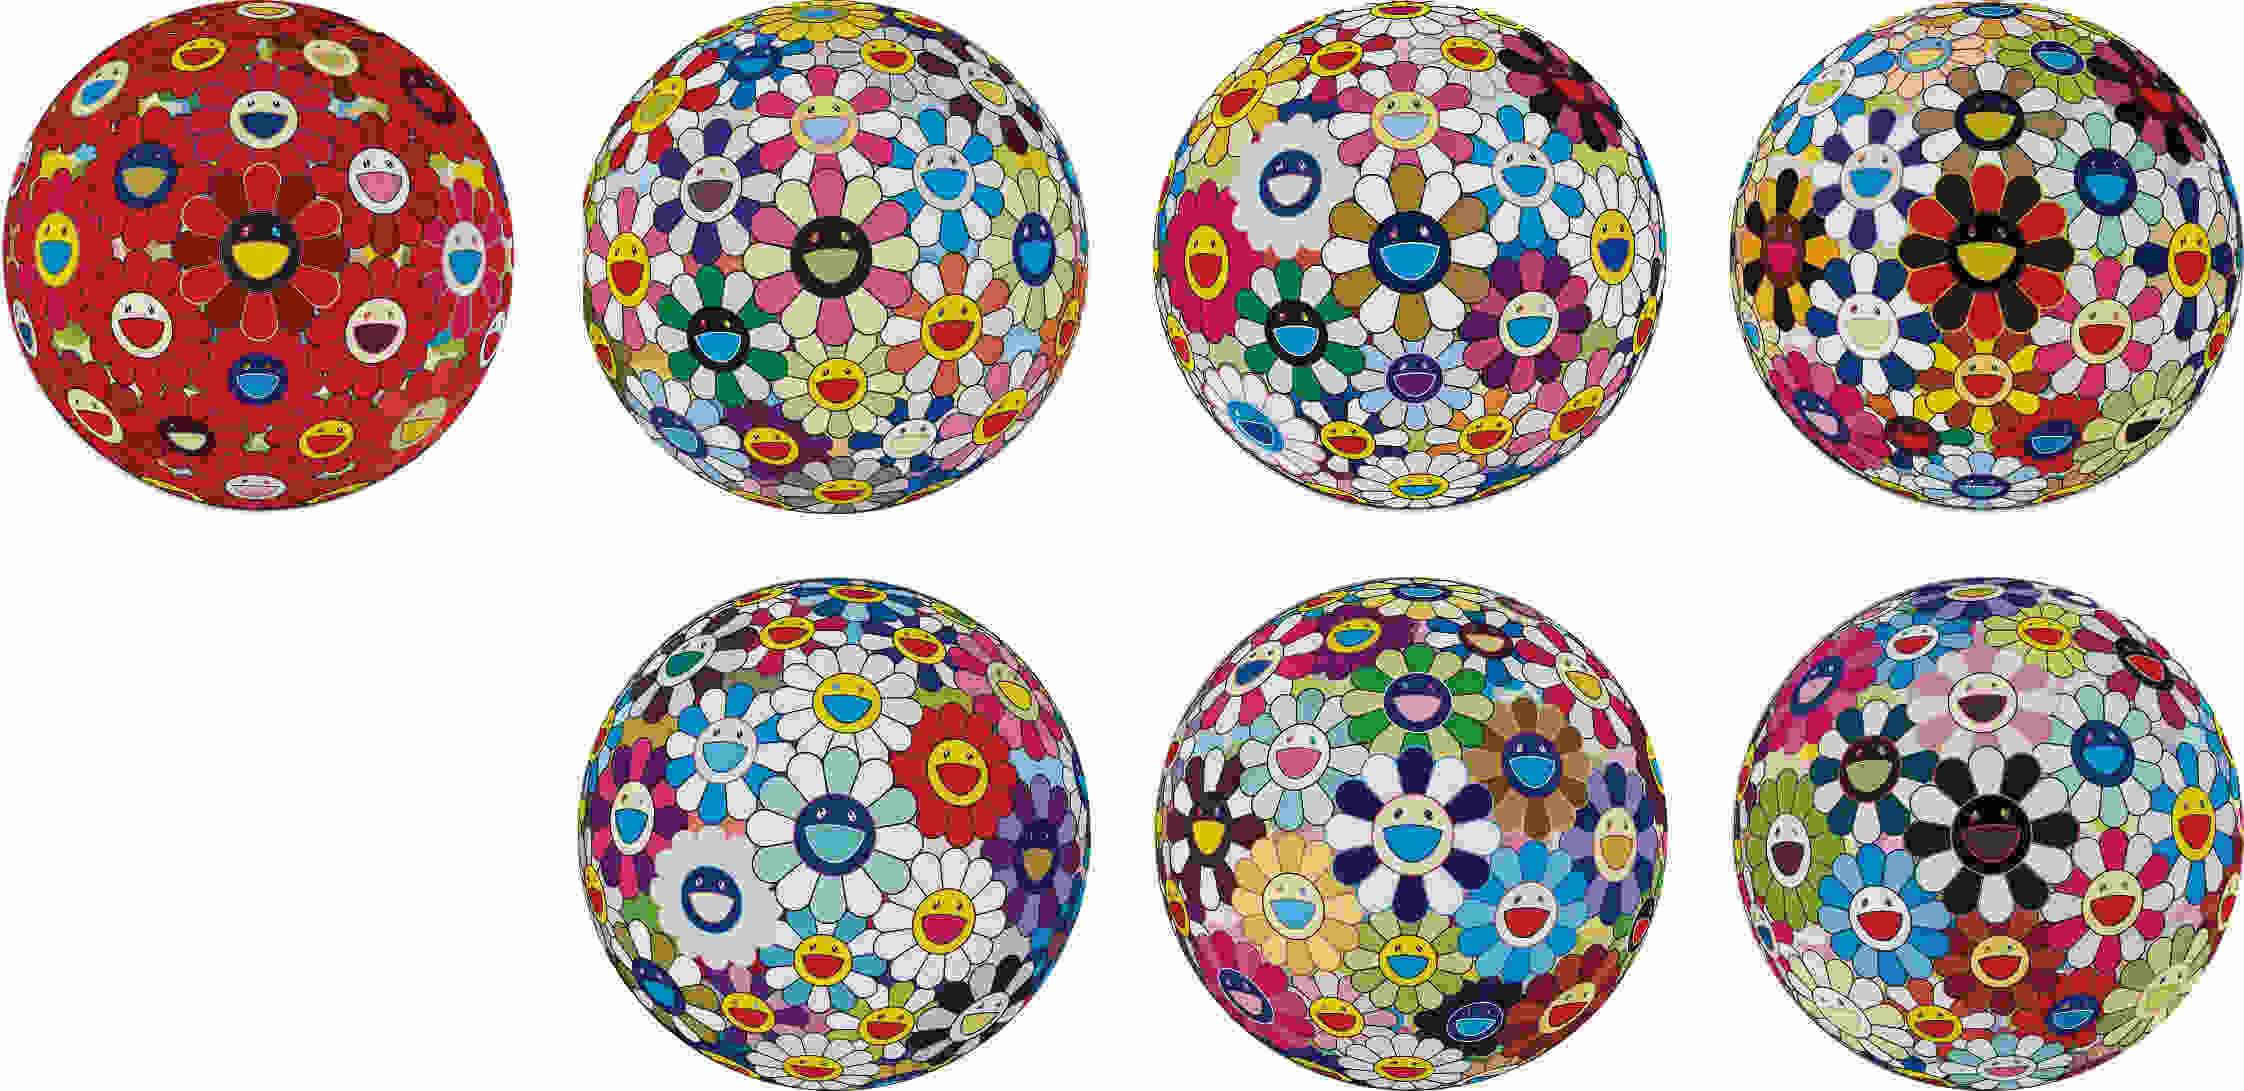 Takashi Murakami-Red Flower Ball (3-D); Flowerball Cosmos (3D); Flower Ball (3-D) Autumn 2004; Flower Ball (Lots of Colors); Flower Ball (3-D) Sequoia Sempervirens; Flower Ball (3-D) Kindergarten; and Flowerball Blood (3-D) V-2013